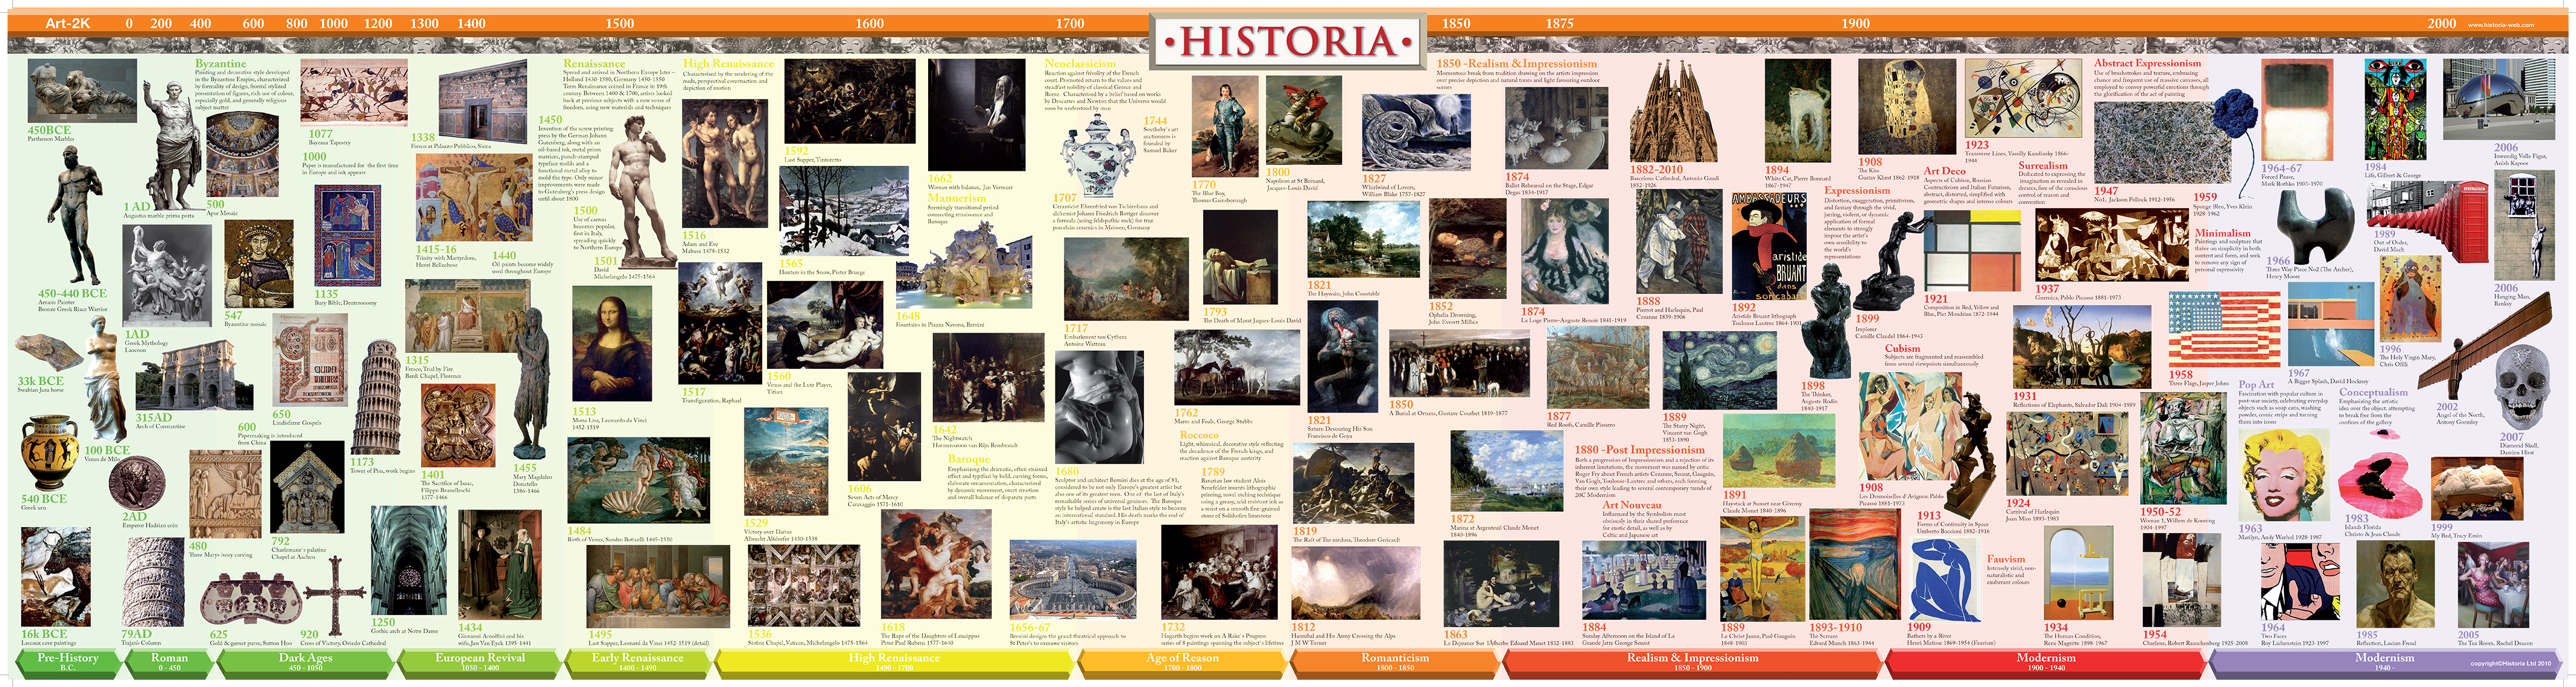 History of Art 2000 Timeline - Historia Timelines | Historia Timelines